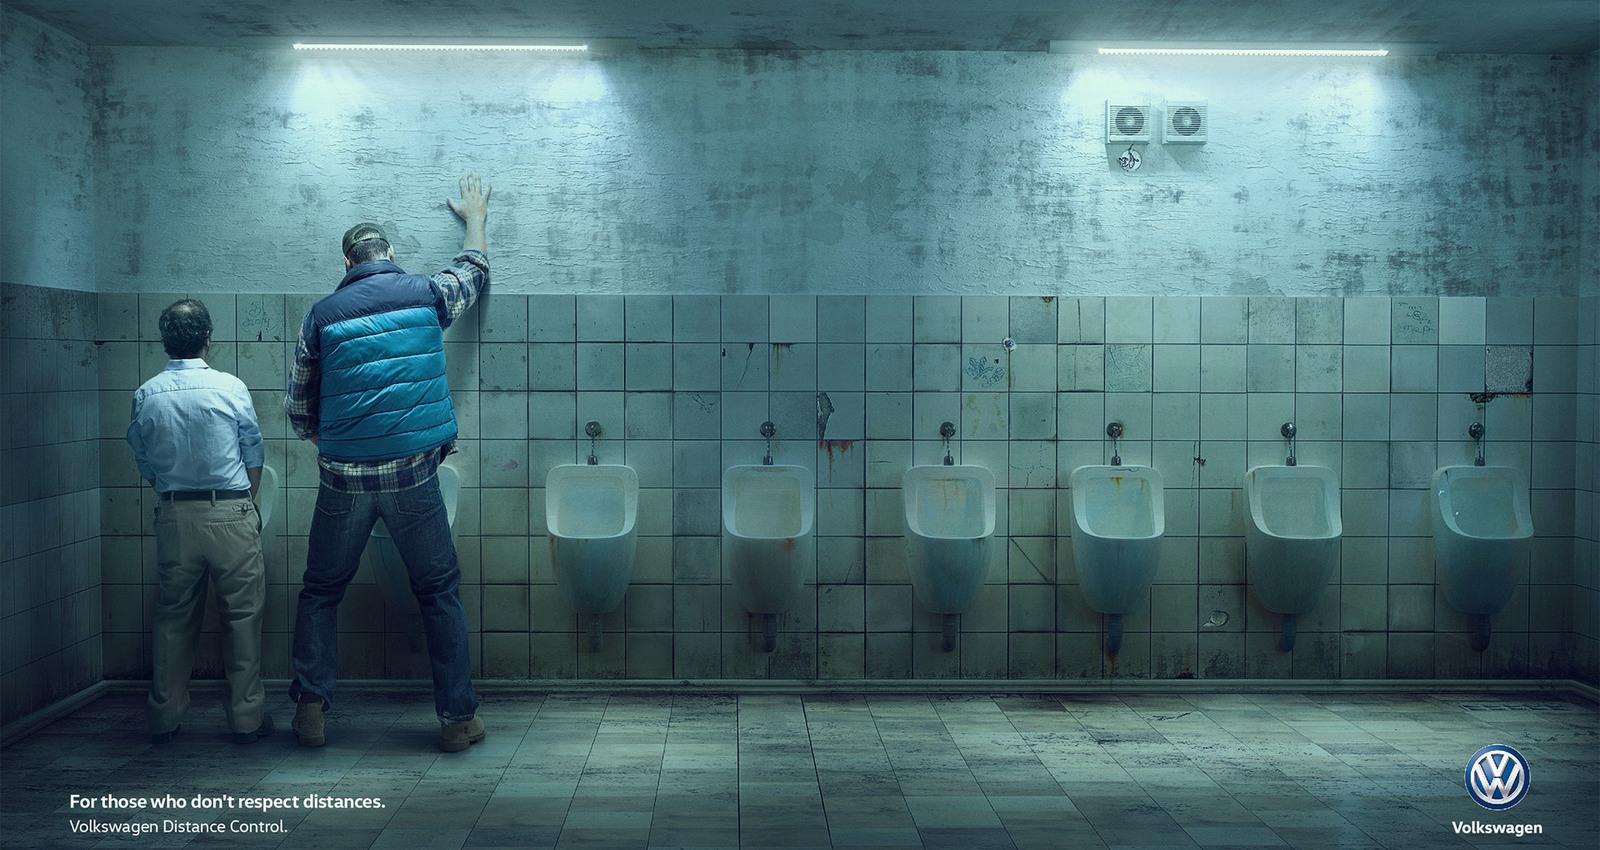 Distance - Urinals